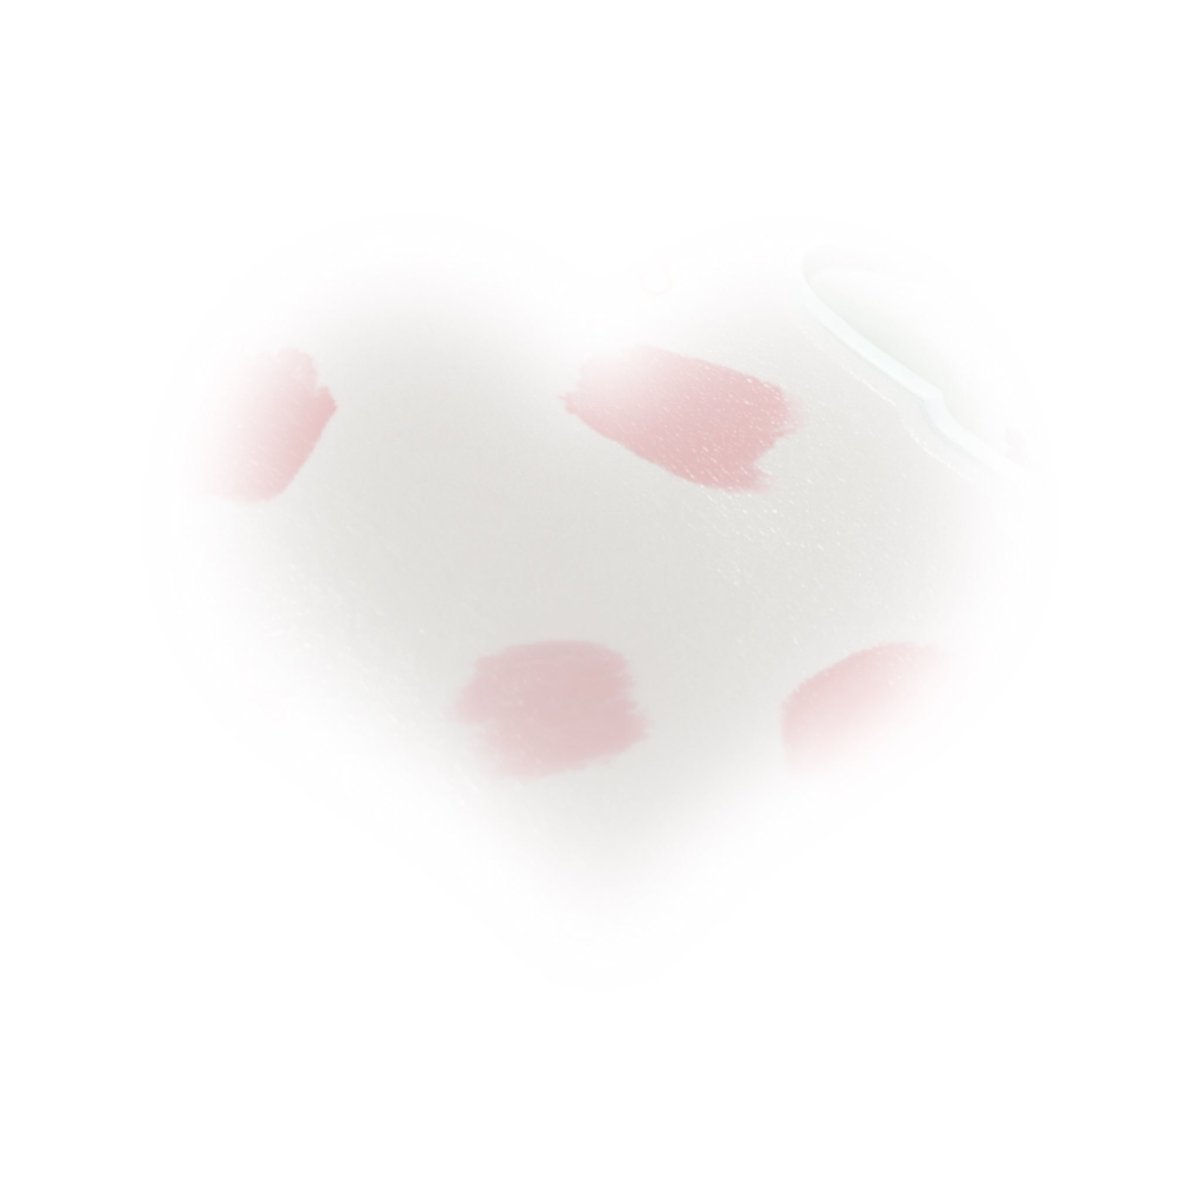 test ツイッターメディア - #DAISO  MILLENNIAL PINK シャカシャカフラットポーチ♡♡  ❤︎  かわいすぎる‧✧̣̥̇‧ ダイソー100円やのにすごい♡♡ https://t.co/tMHFFLd3GO